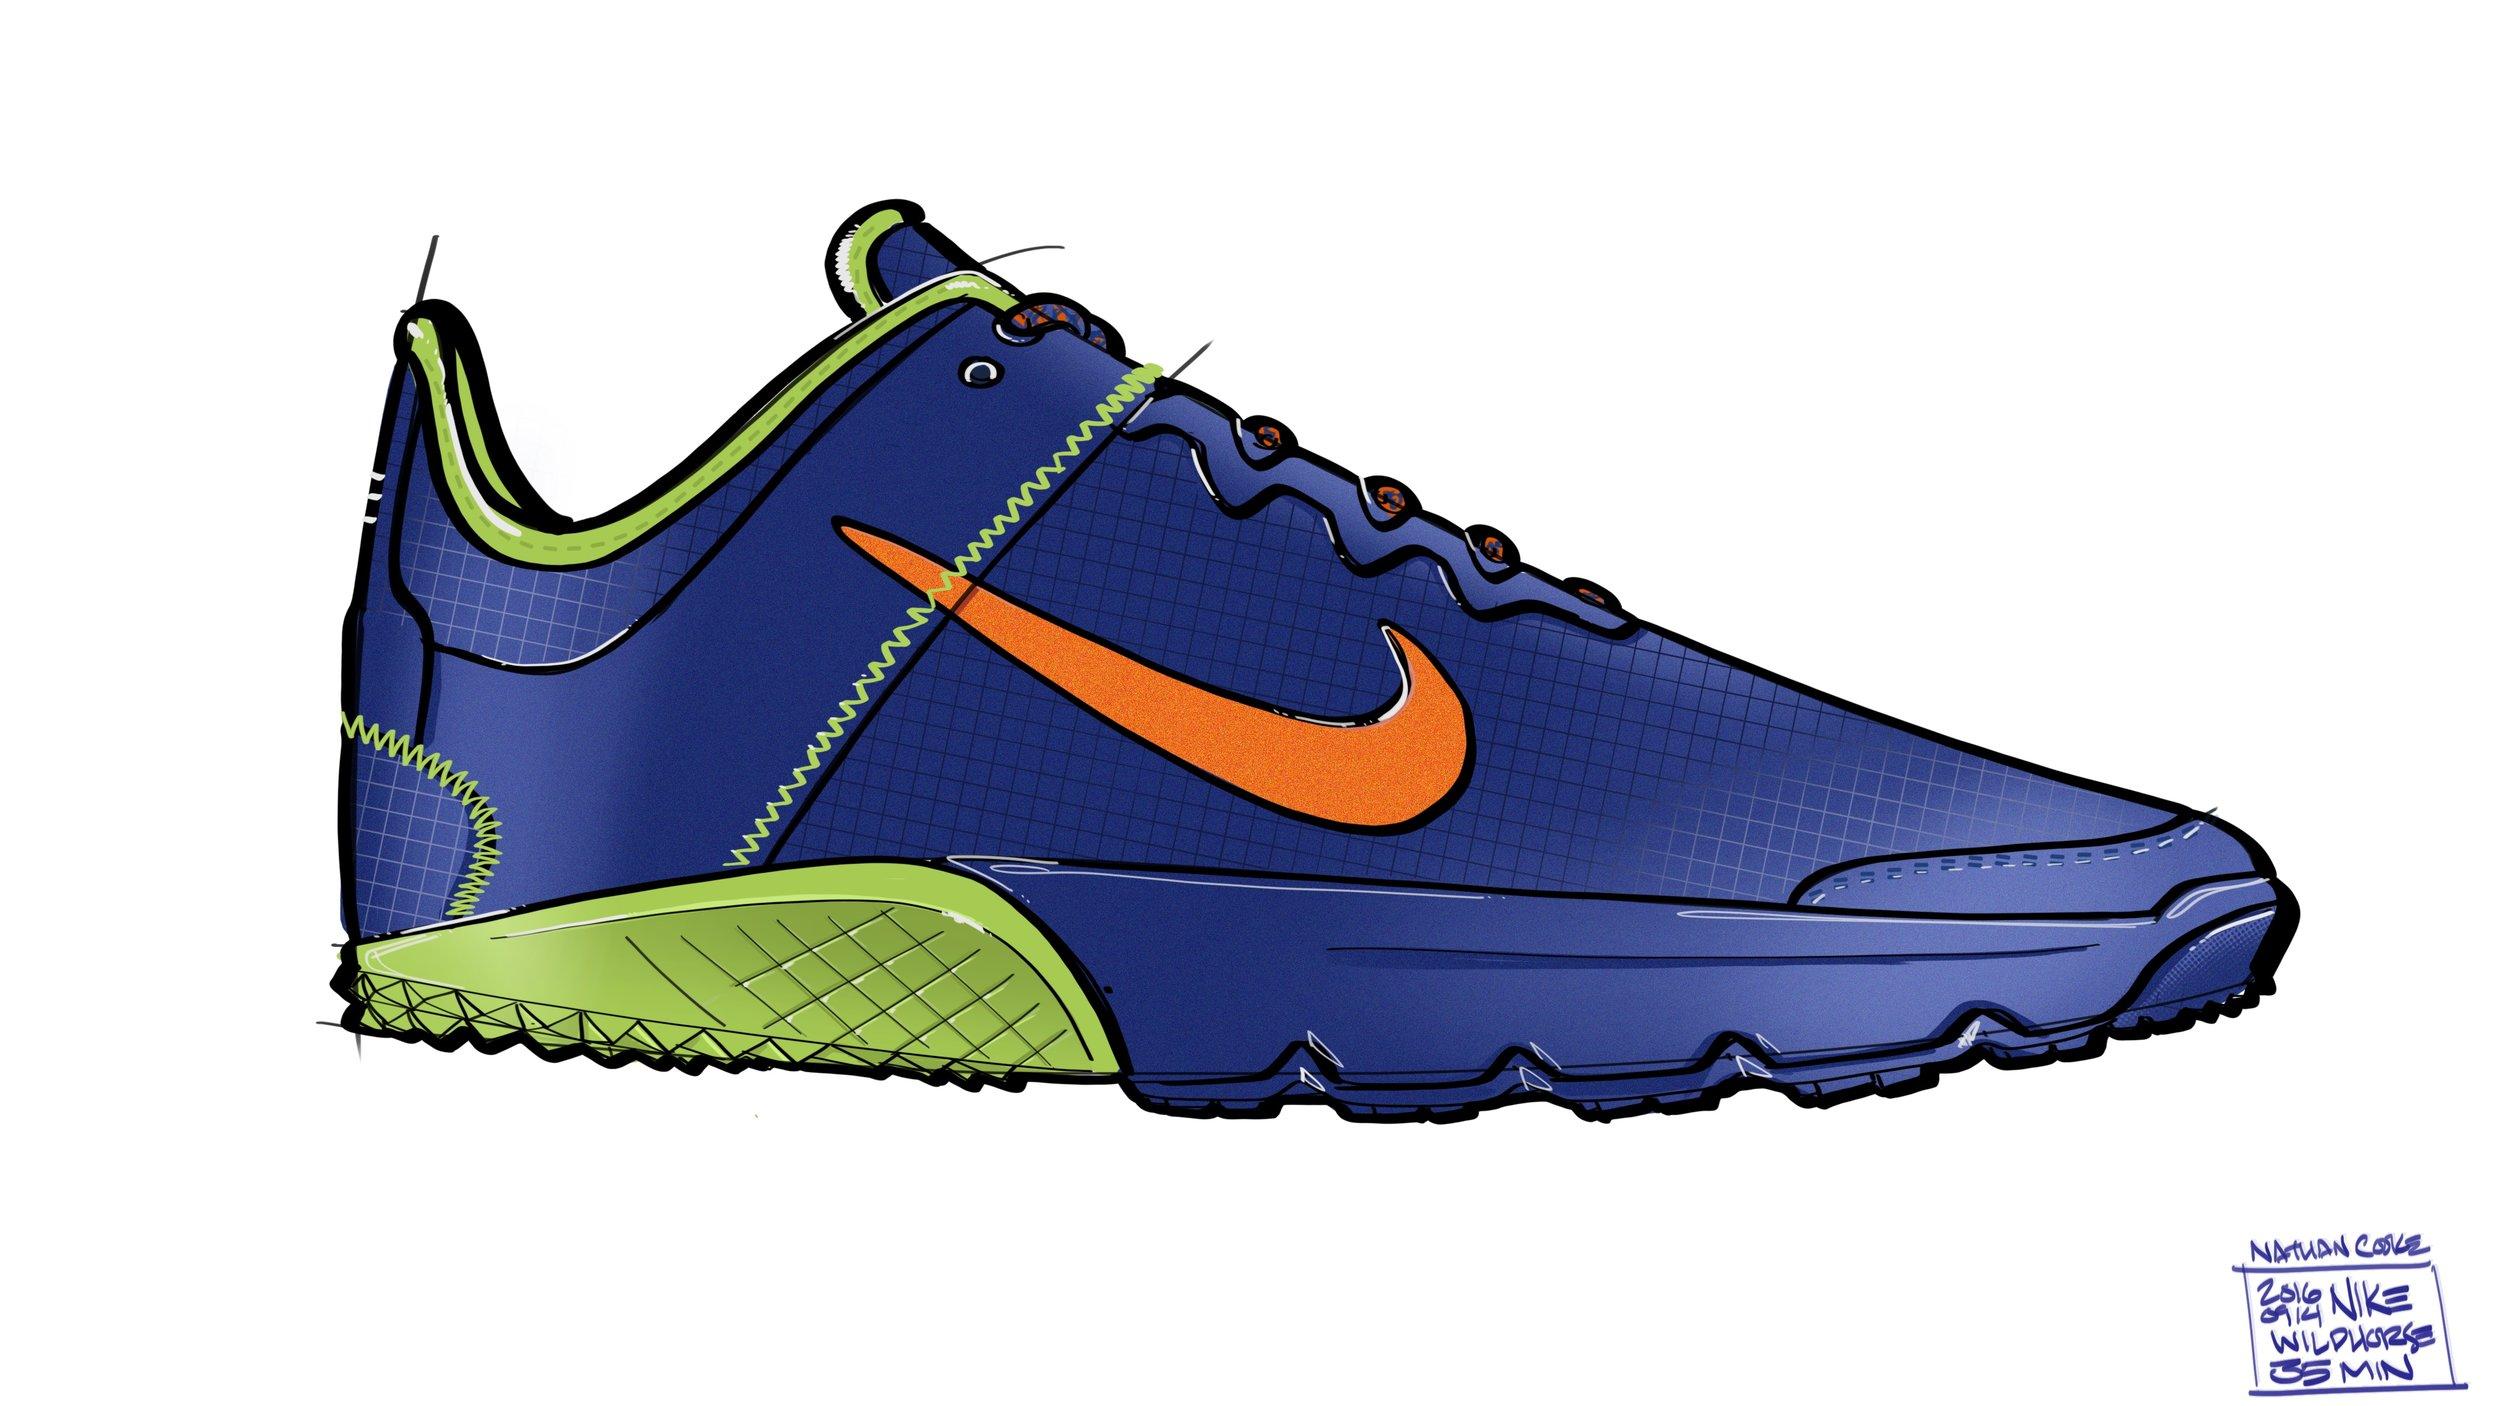 Trail_Shoes_NIKE.jpg